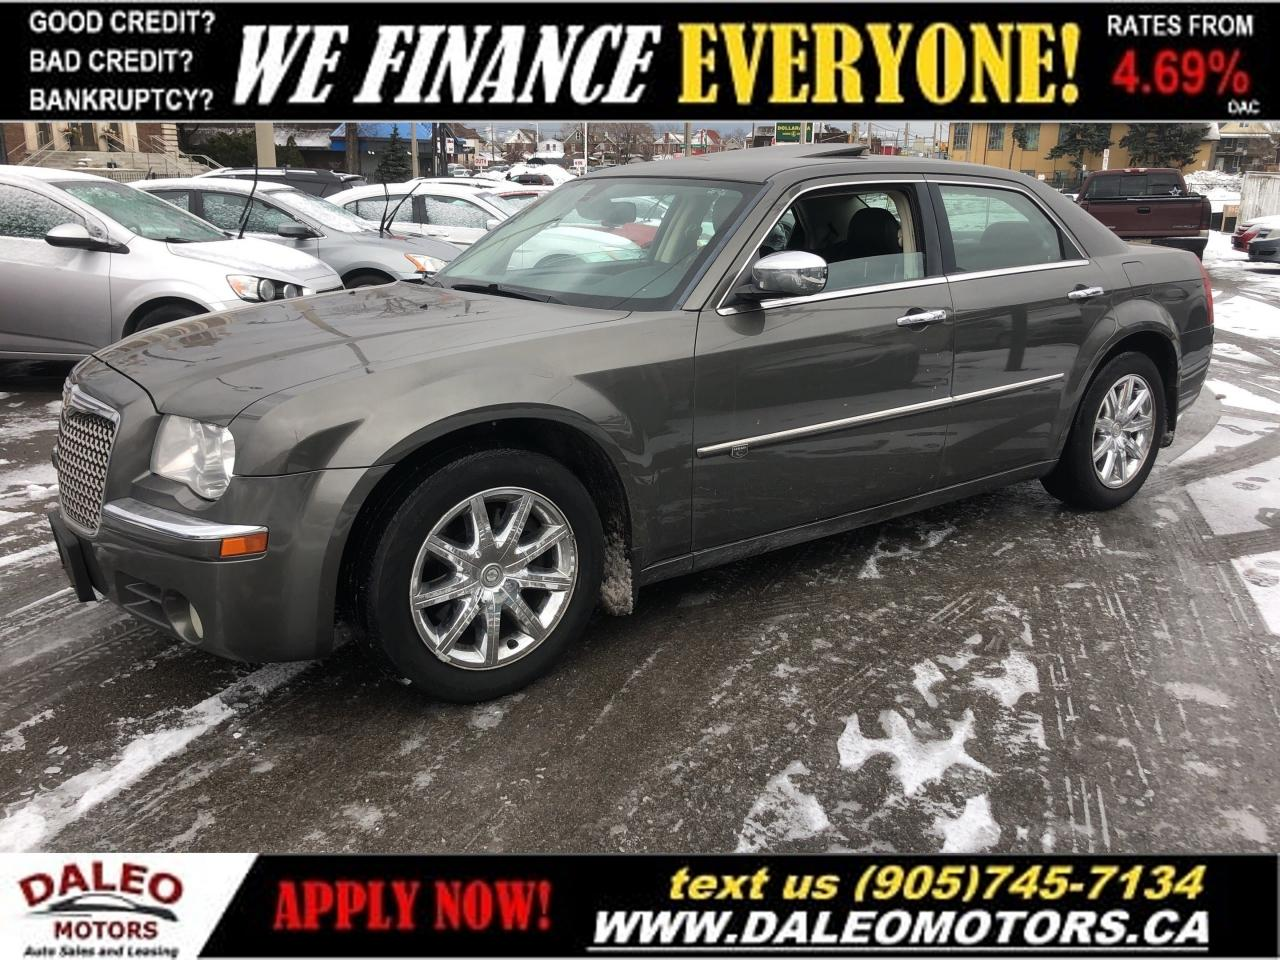 2010 Chrysler 300C V8|LEATHER|MOONROOF|HEATEDSEATS